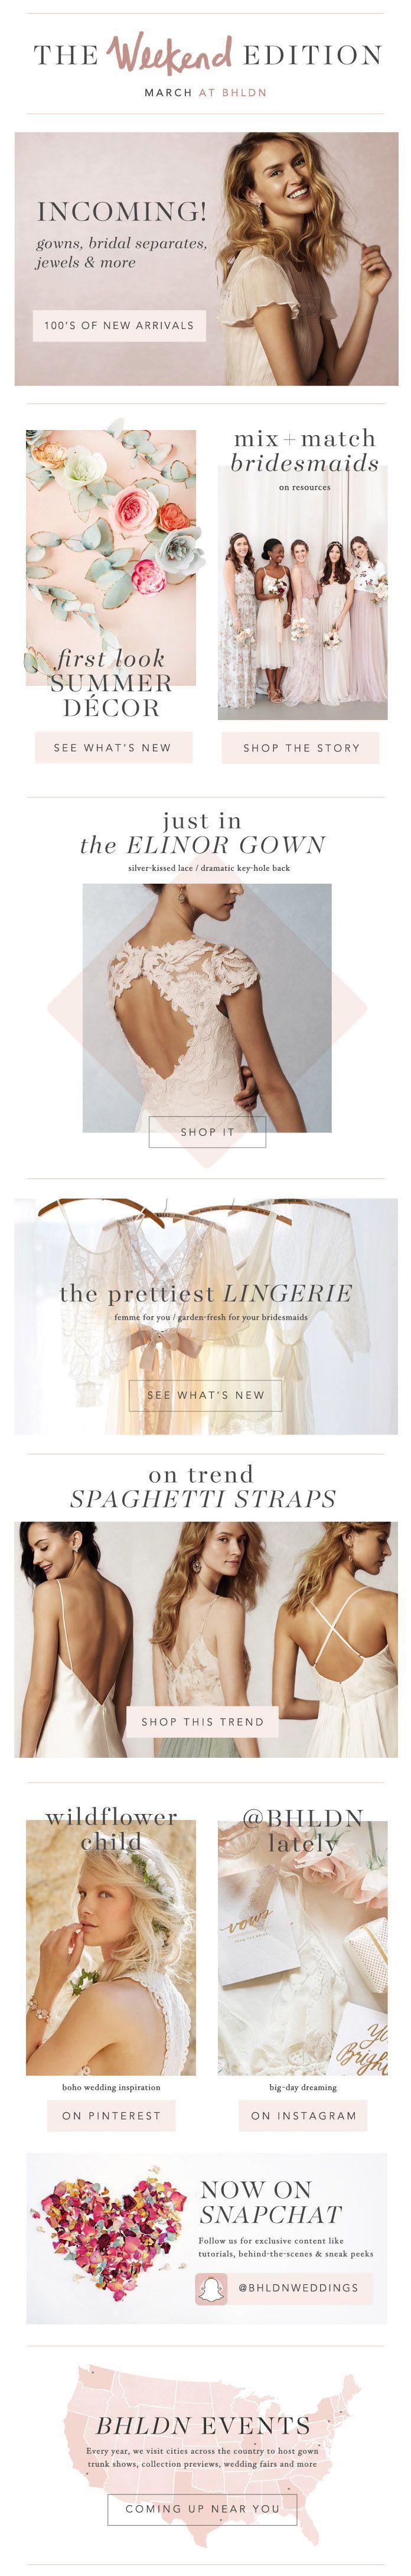 BHLDN | Anthropologie Weddings | March Newsletter | Email Design